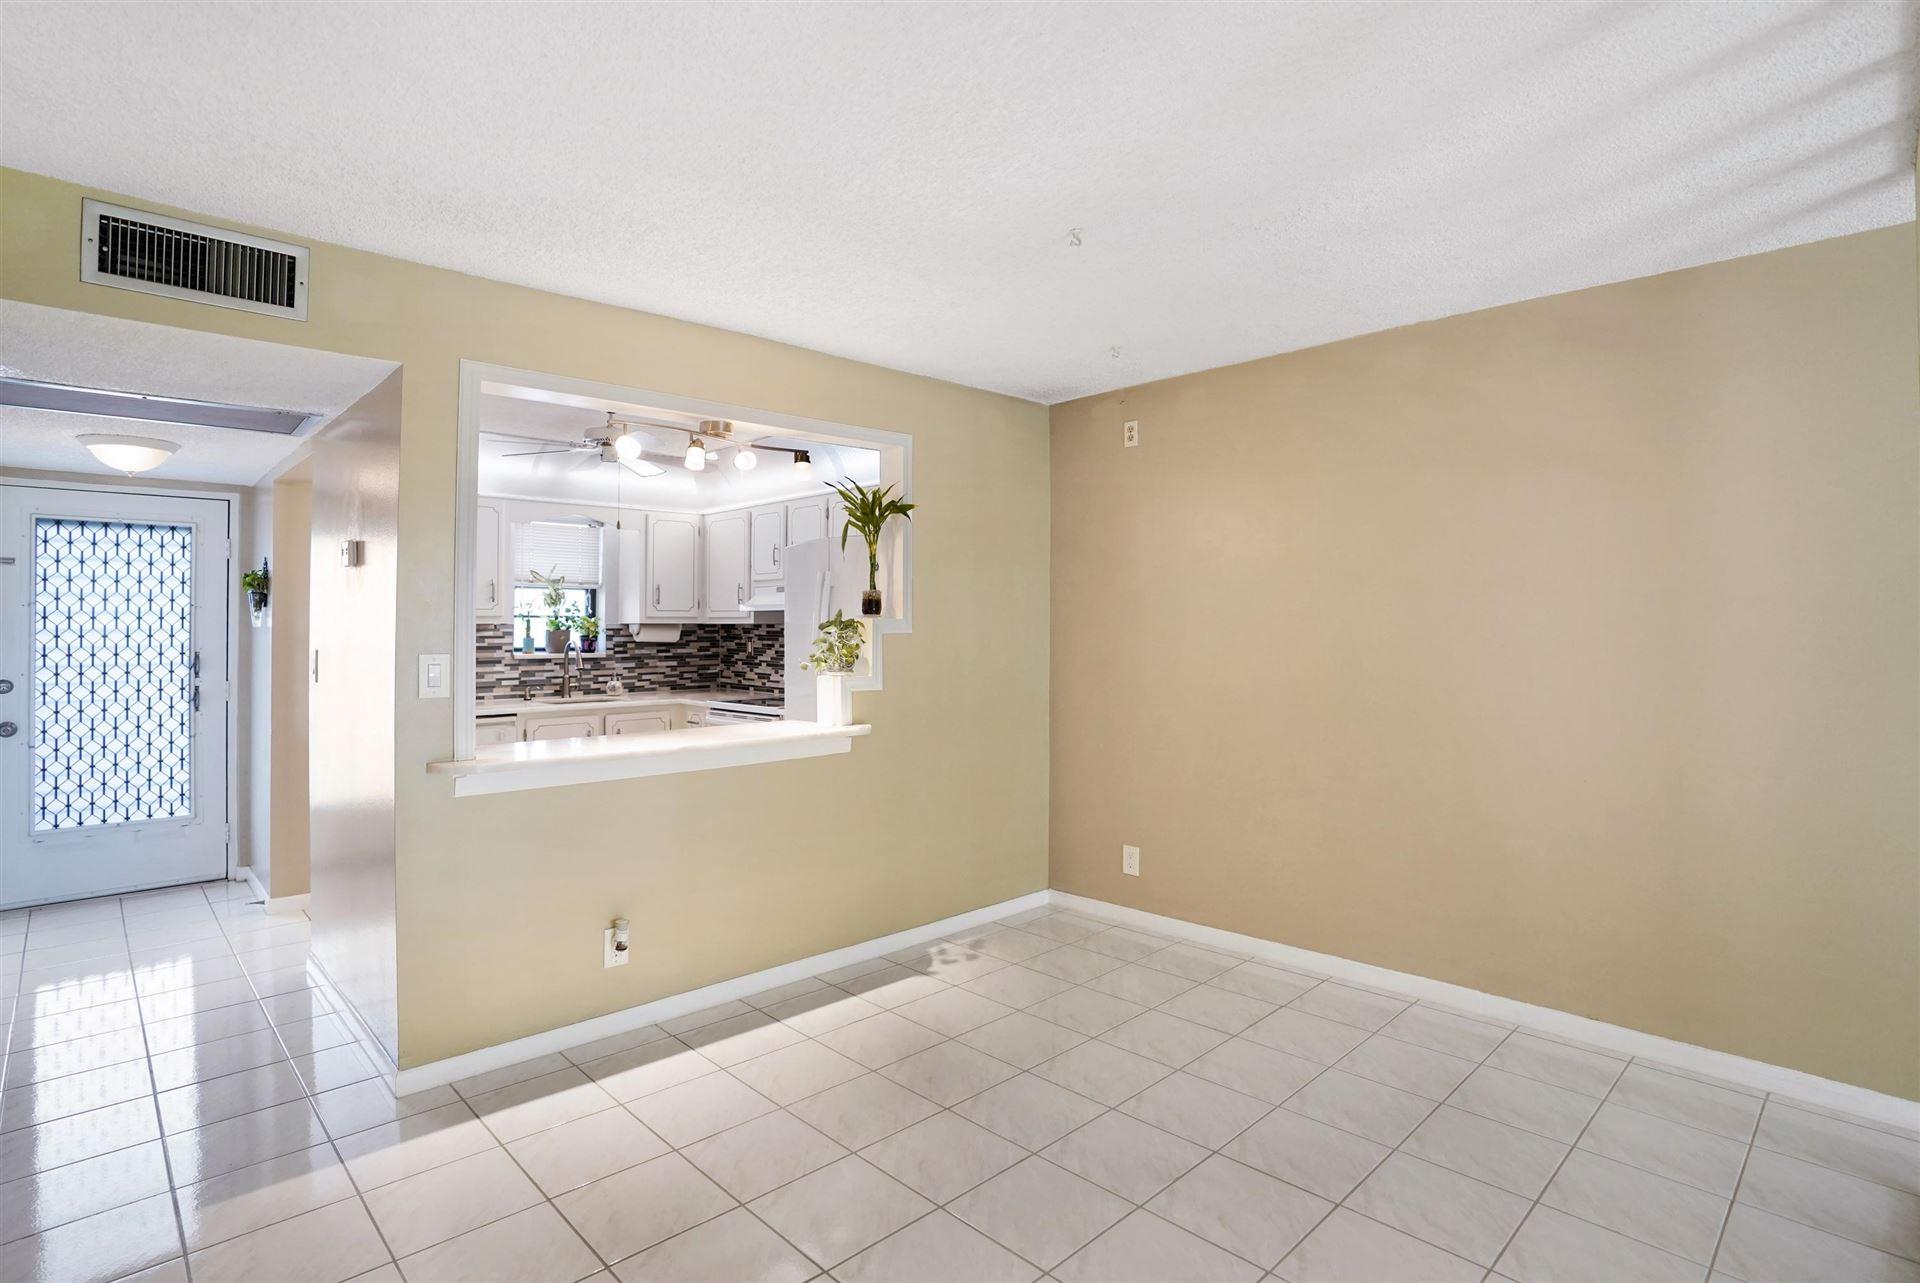 Photo of 9440 SW 8th Street #206, Boca Raton, FL 33428 (MLS # RX-10716878)